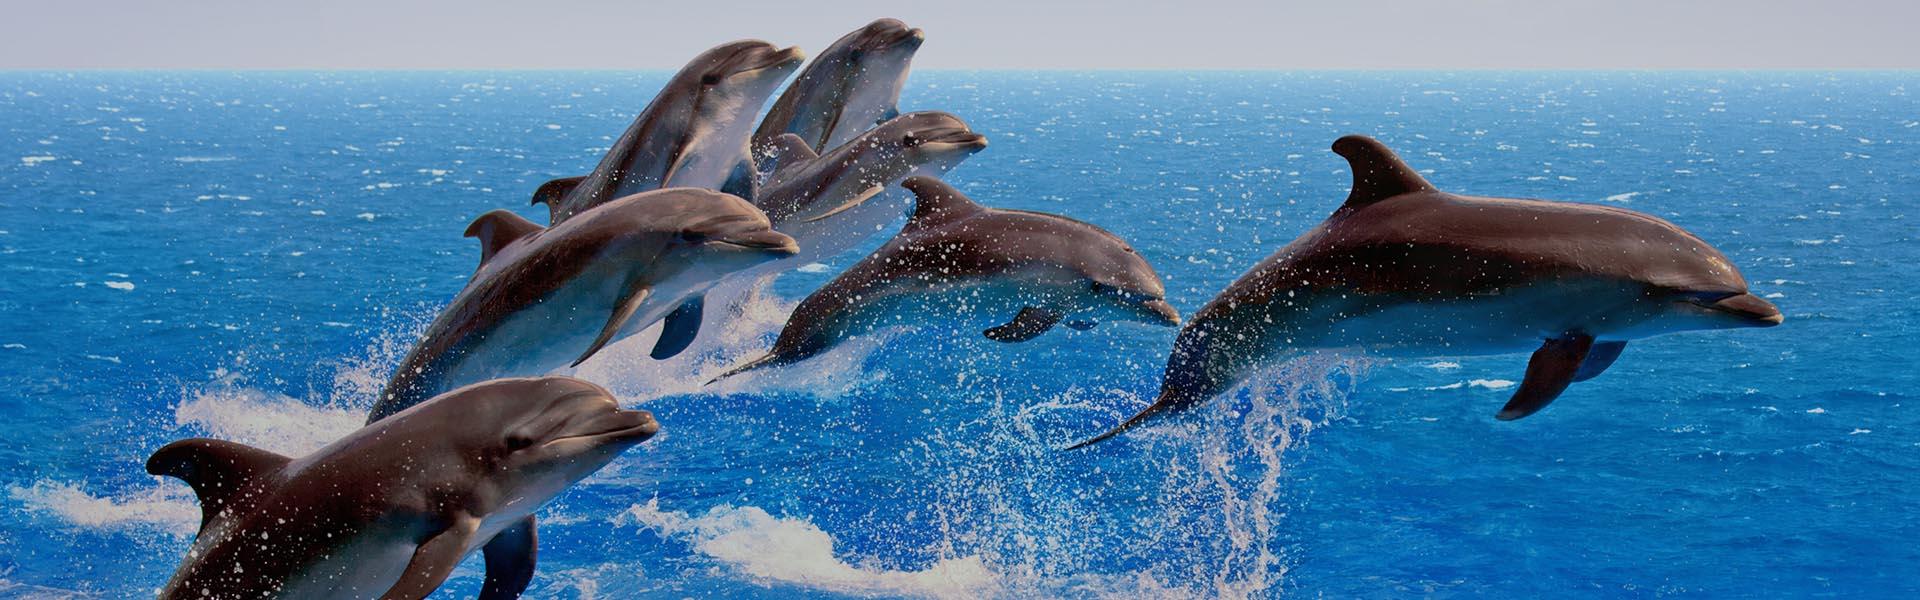 dolphins_header